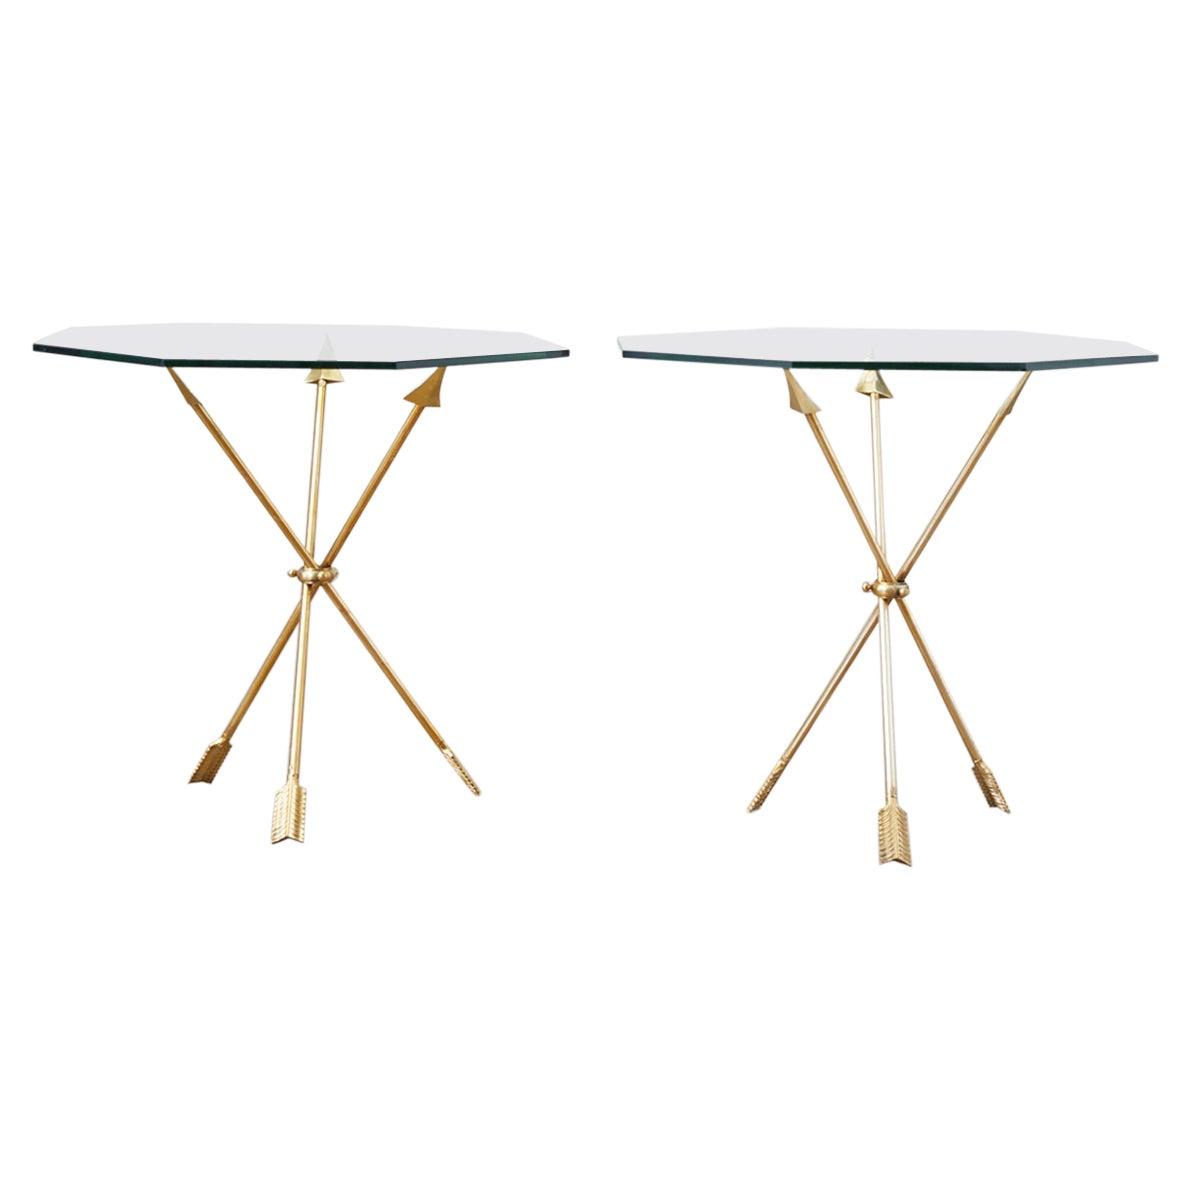 Pair of Maison Jansen Style Directoire Arrow Drink Tables